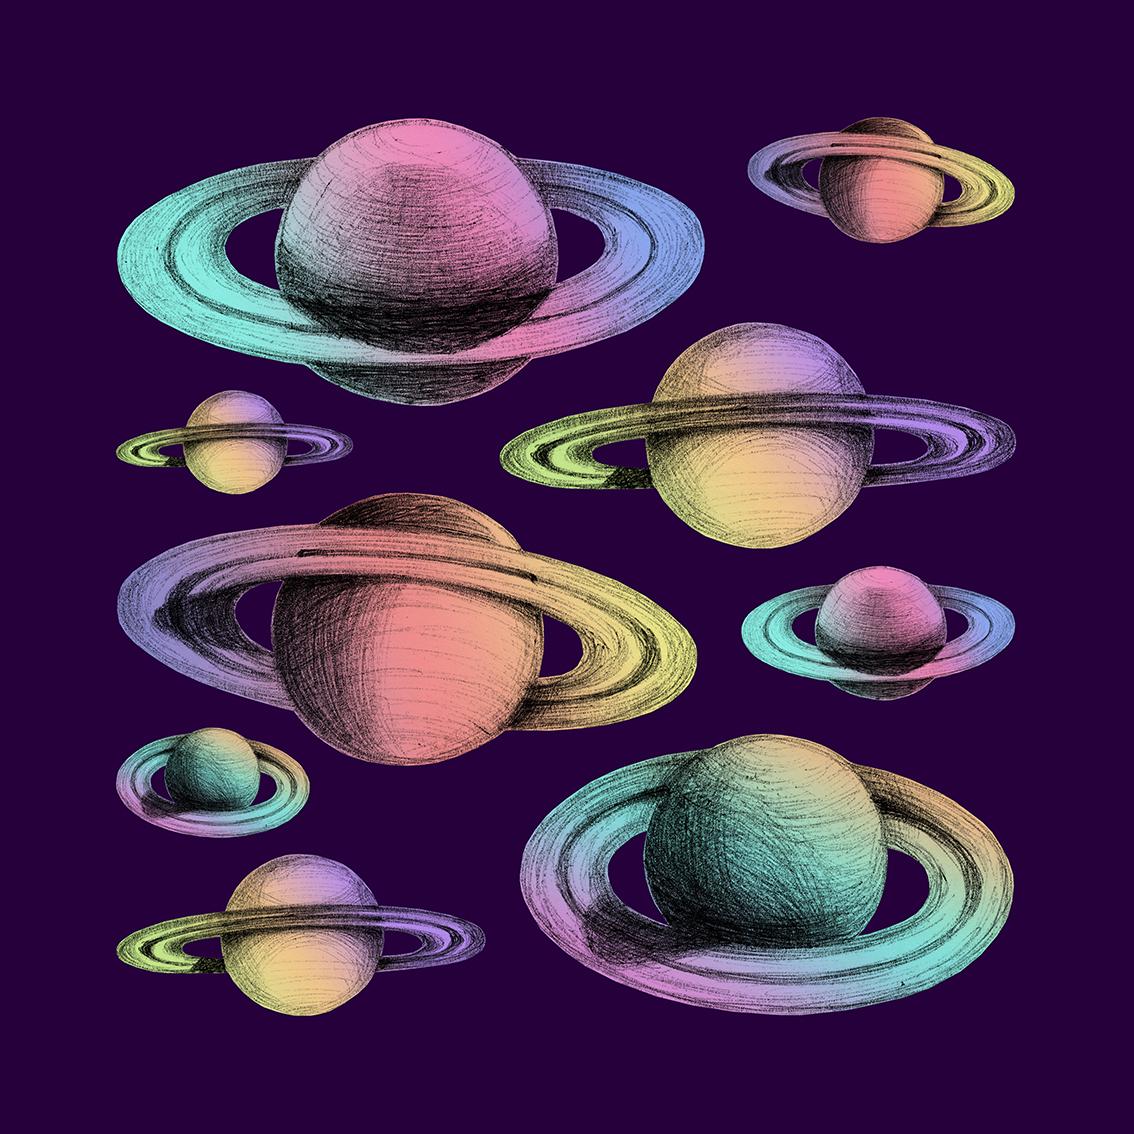 Disco Saturns -> https://society6.com/product/disco-saturns_print… -> https://www.teepublic.com/t-shirt/7196182-disco-saturns?store_id=255743… >https://www.redbubble.com/people/zeljkica/works/43231609-disco-saturns?asc=u&kind=transparent_sticker&p=transparent-sticker&rel=carousel&size=extra_large…  #saturn #saturns #saturnart #saturnartwork #saturnlove #saturnpattern #saturnlover #saturnlovers #instaart #instaartwork #redbubblecreate @redbubblecreate #redbubbleshop #redbubblestorepic.twitter.com/fHBlqAd4iT